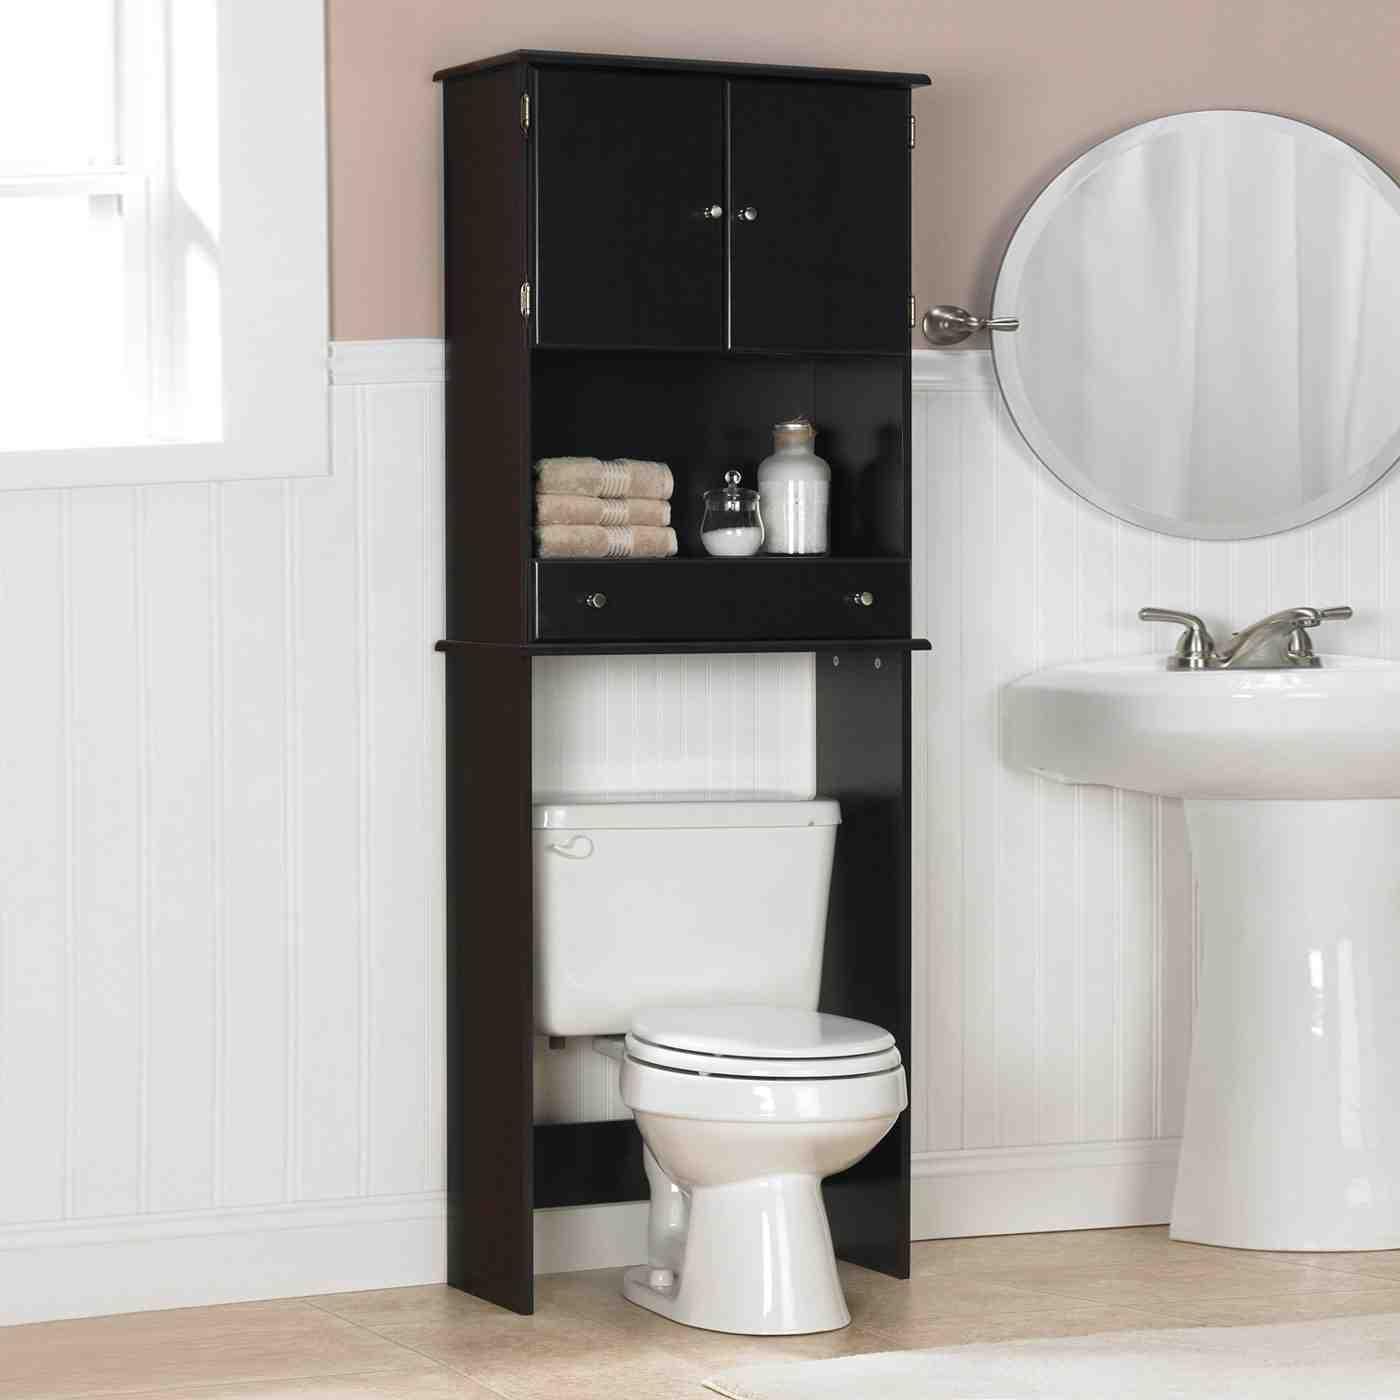 Home Exterior Wall Design: Black Bathroom Storage Cabinet